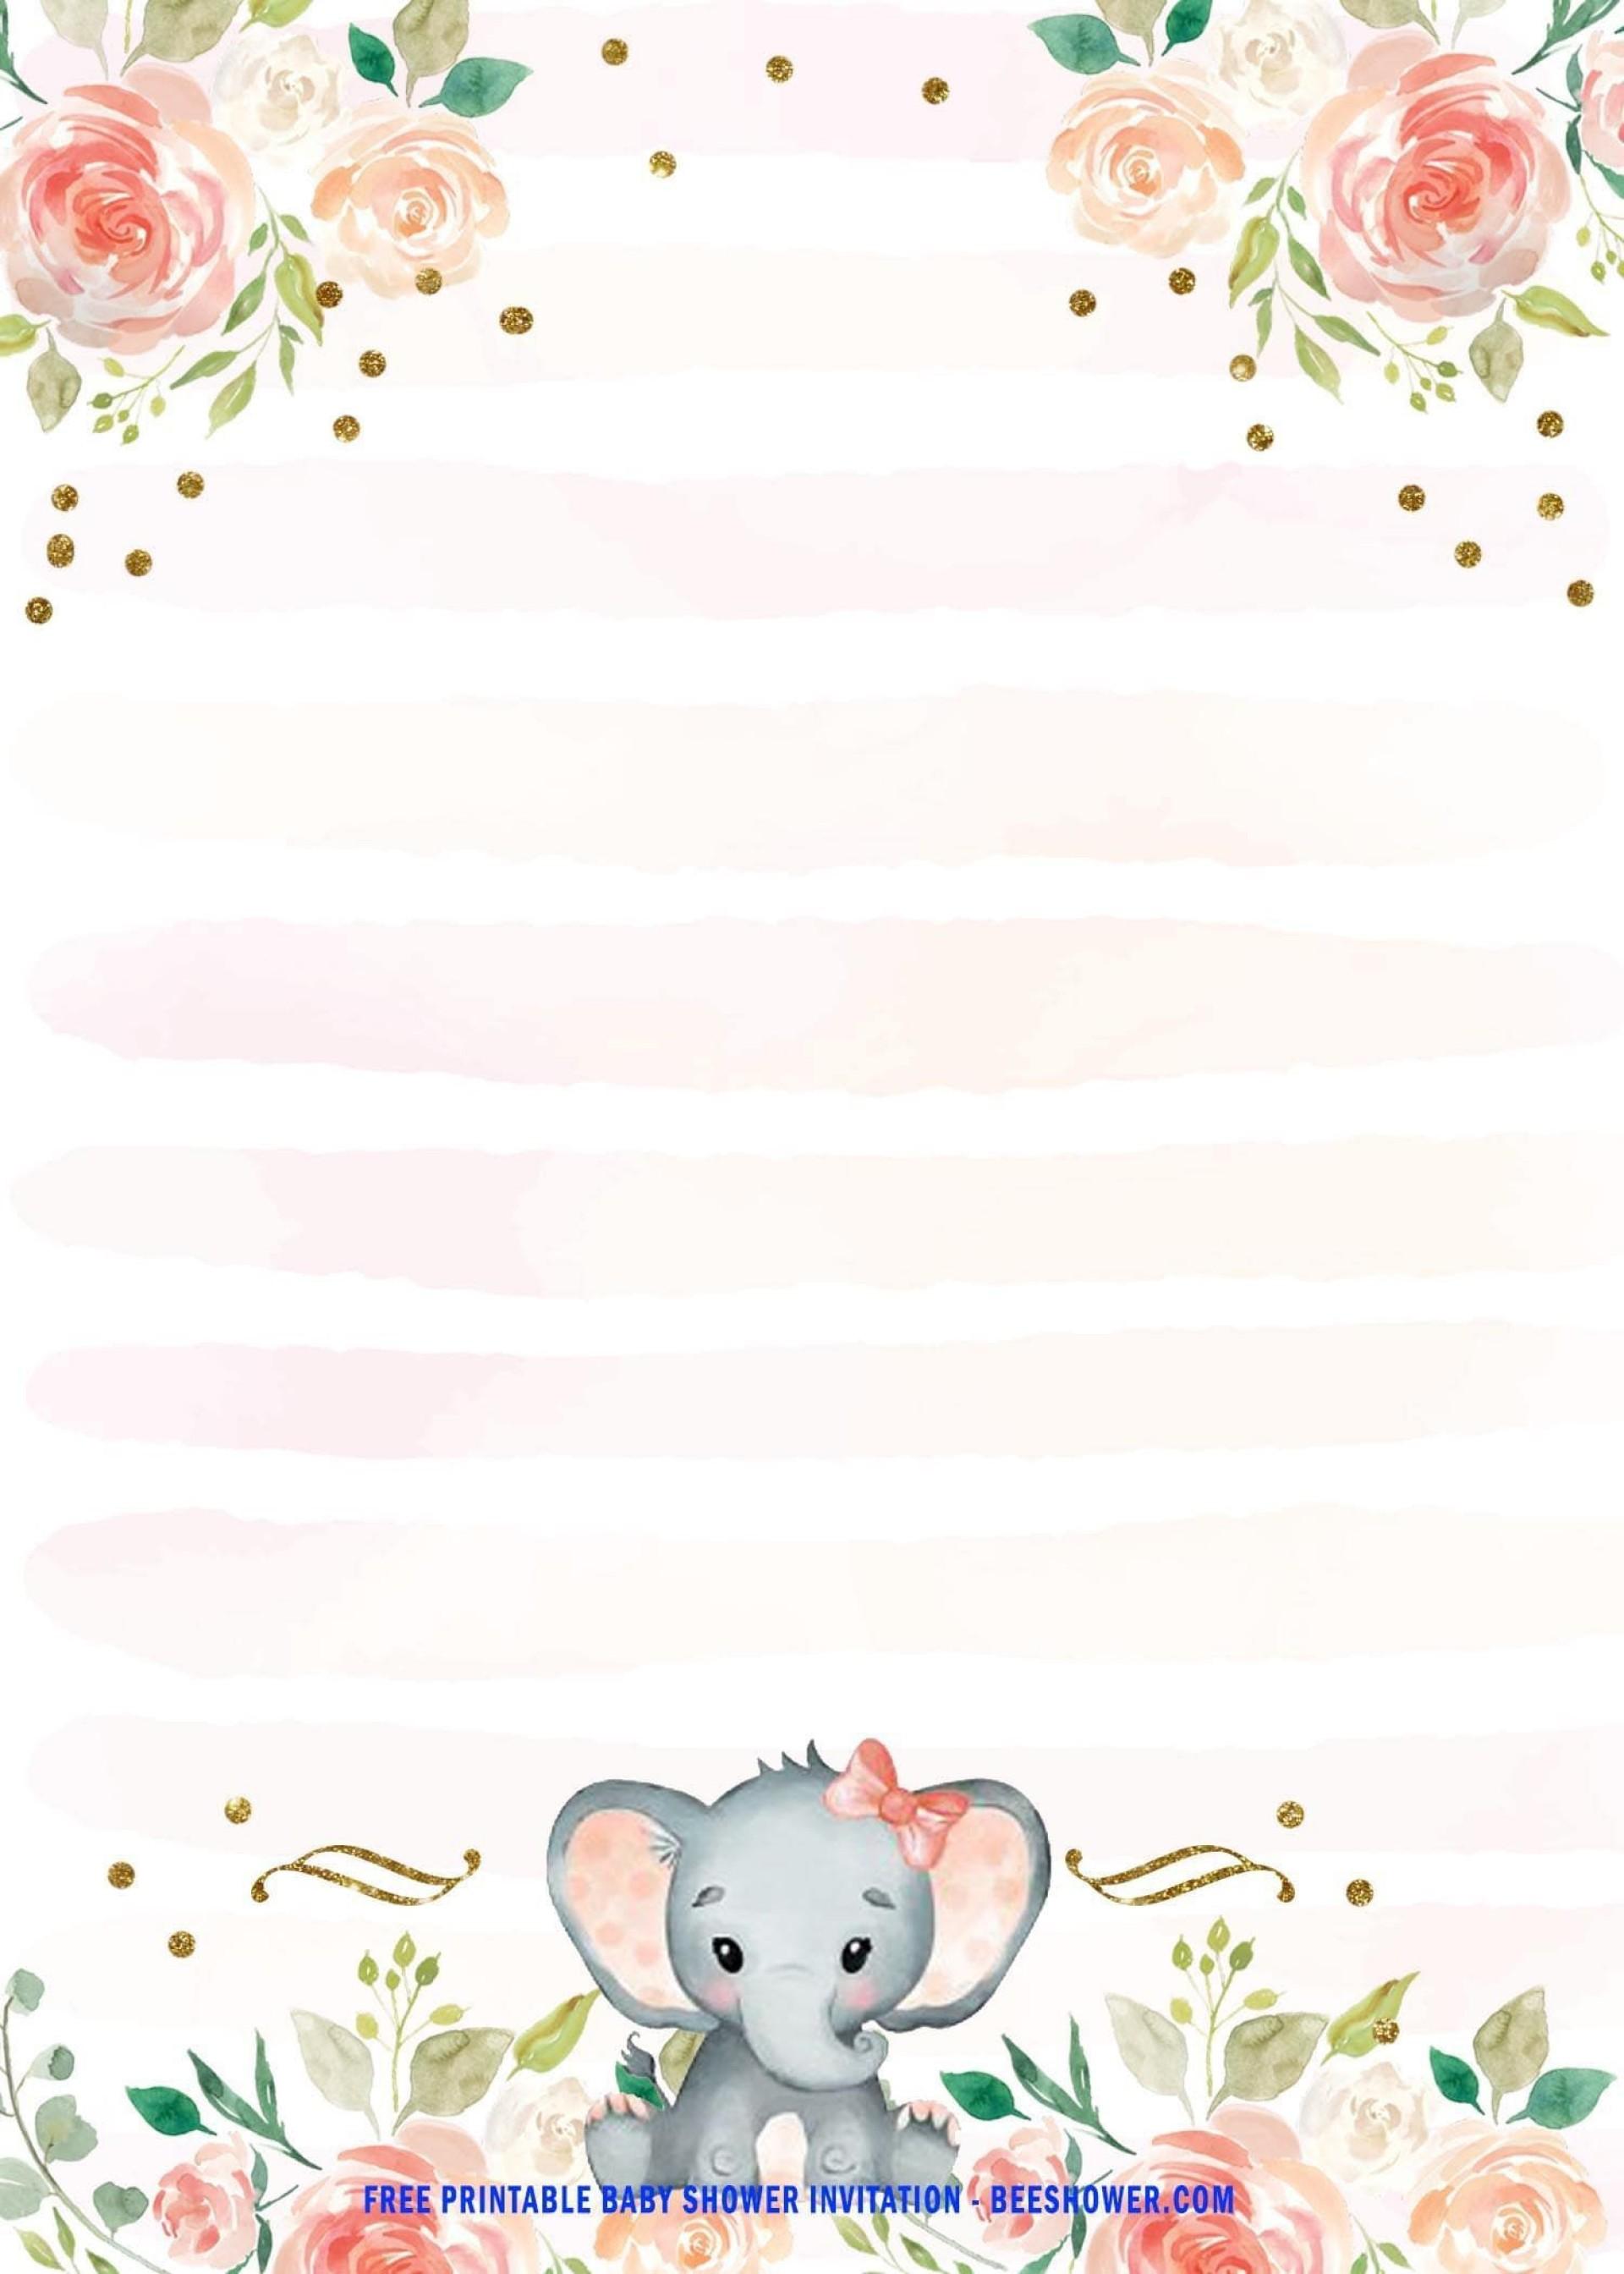 004 Stupendou Free Printable Elephant Baby Shower Invitation Template Example  Templates Editable1920